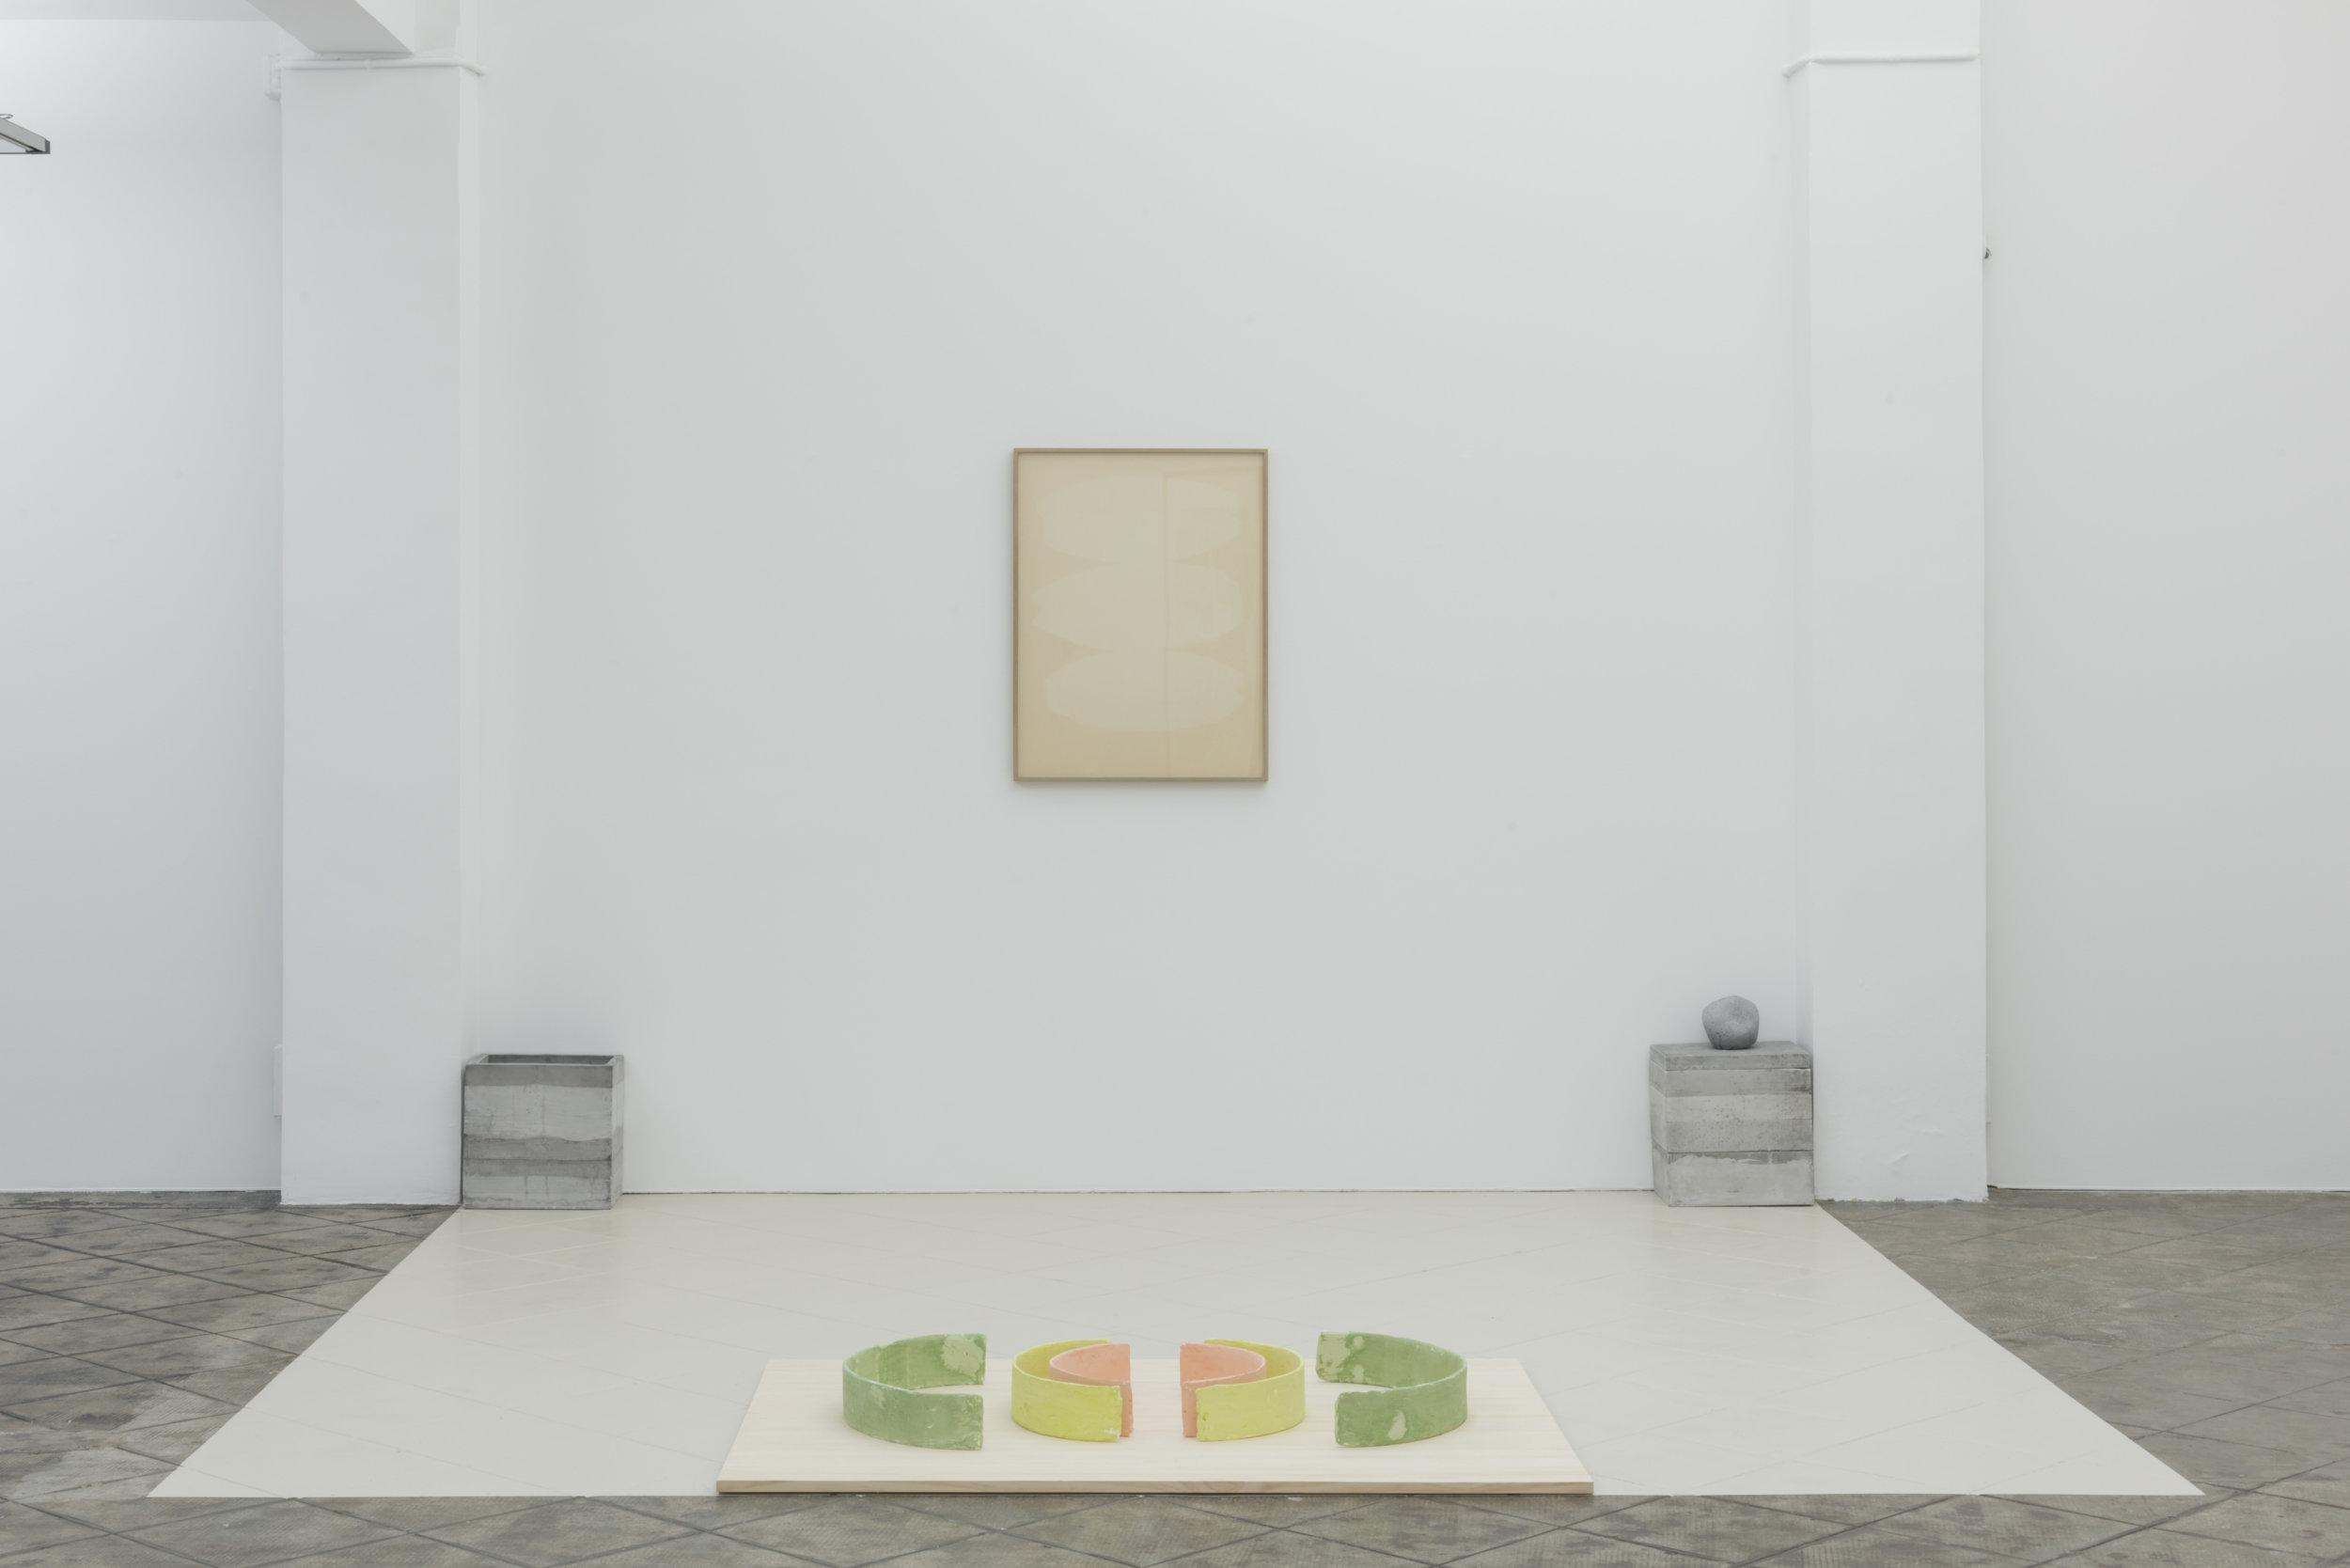 Installation view: Formes Absents. Patricia Dauder. ProjecteSD, Barcelona, 2015 |  | ProjecteSD